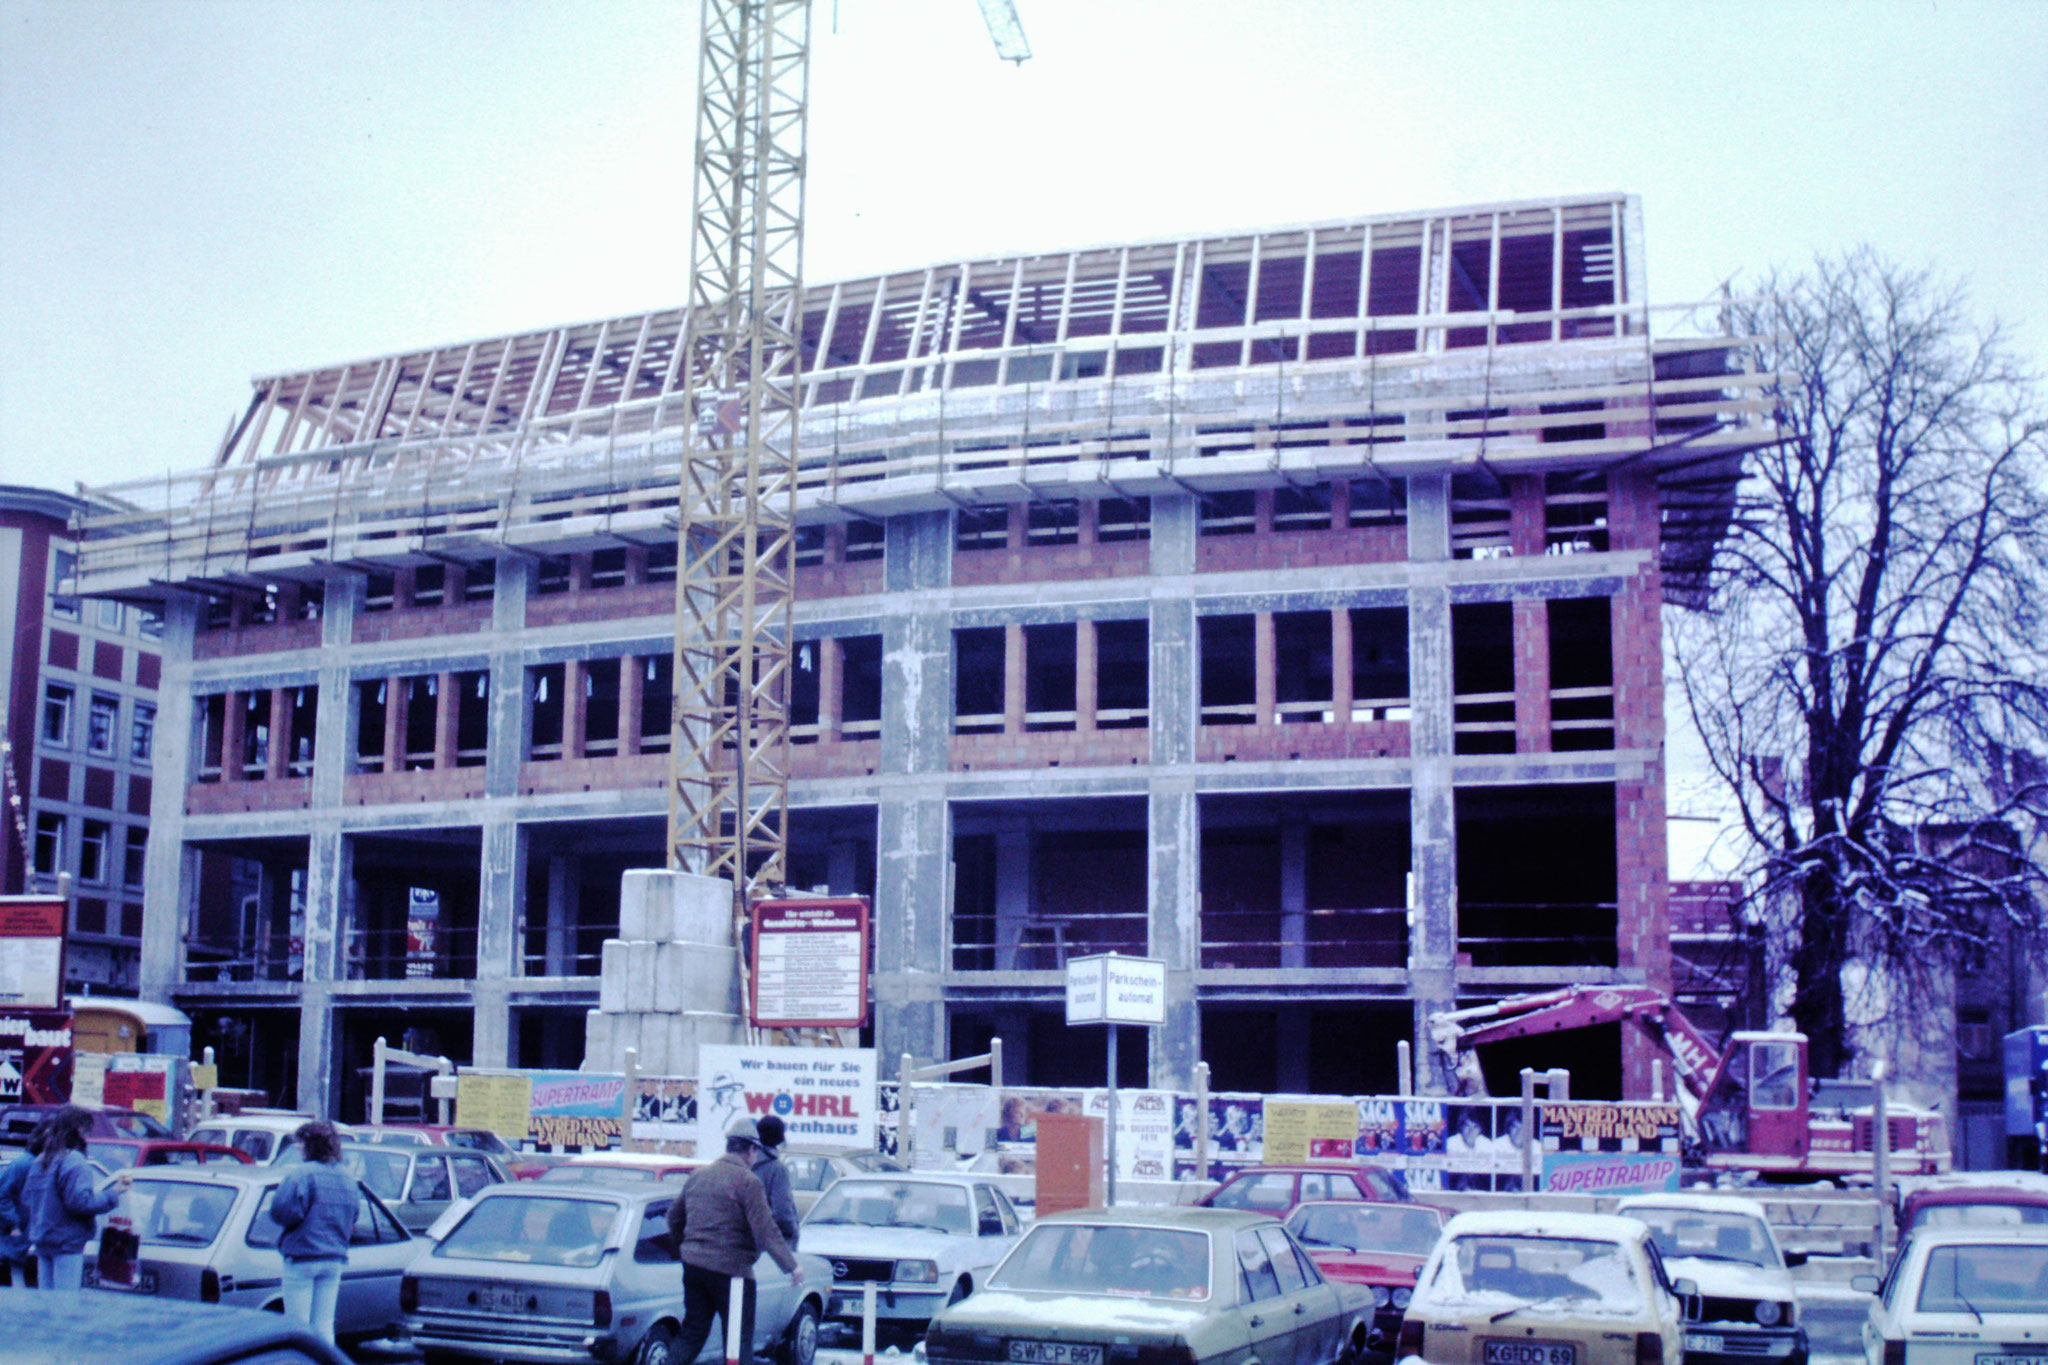 1986 - Baustelle Union Wohnbau